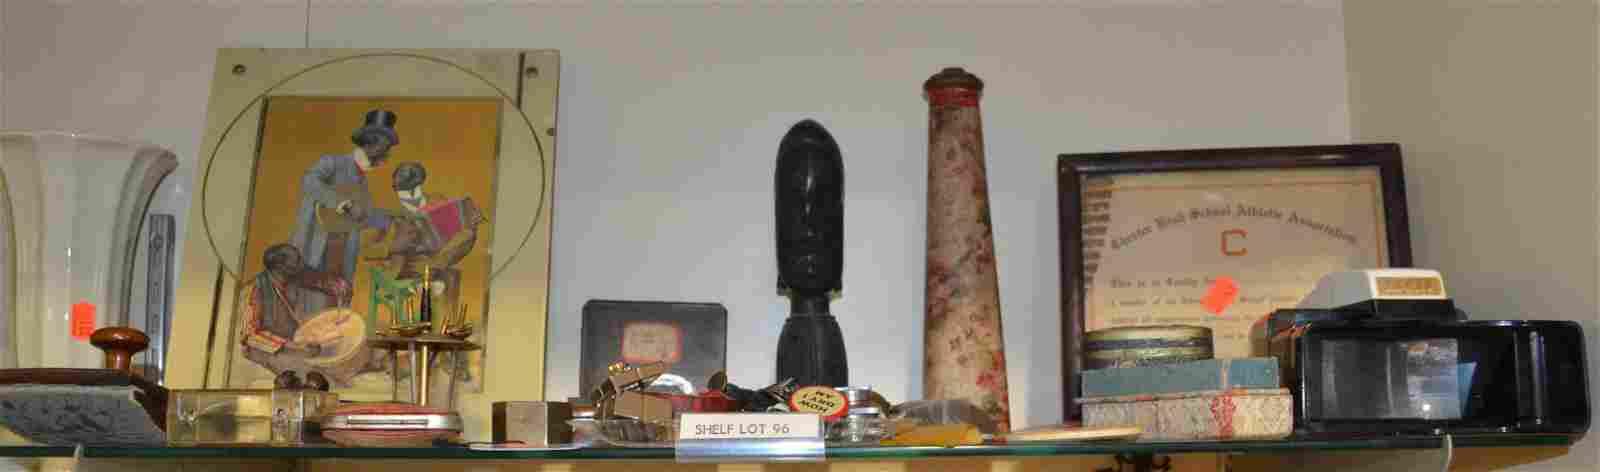 Shelf #96 - Jewelry, Ink Blotter